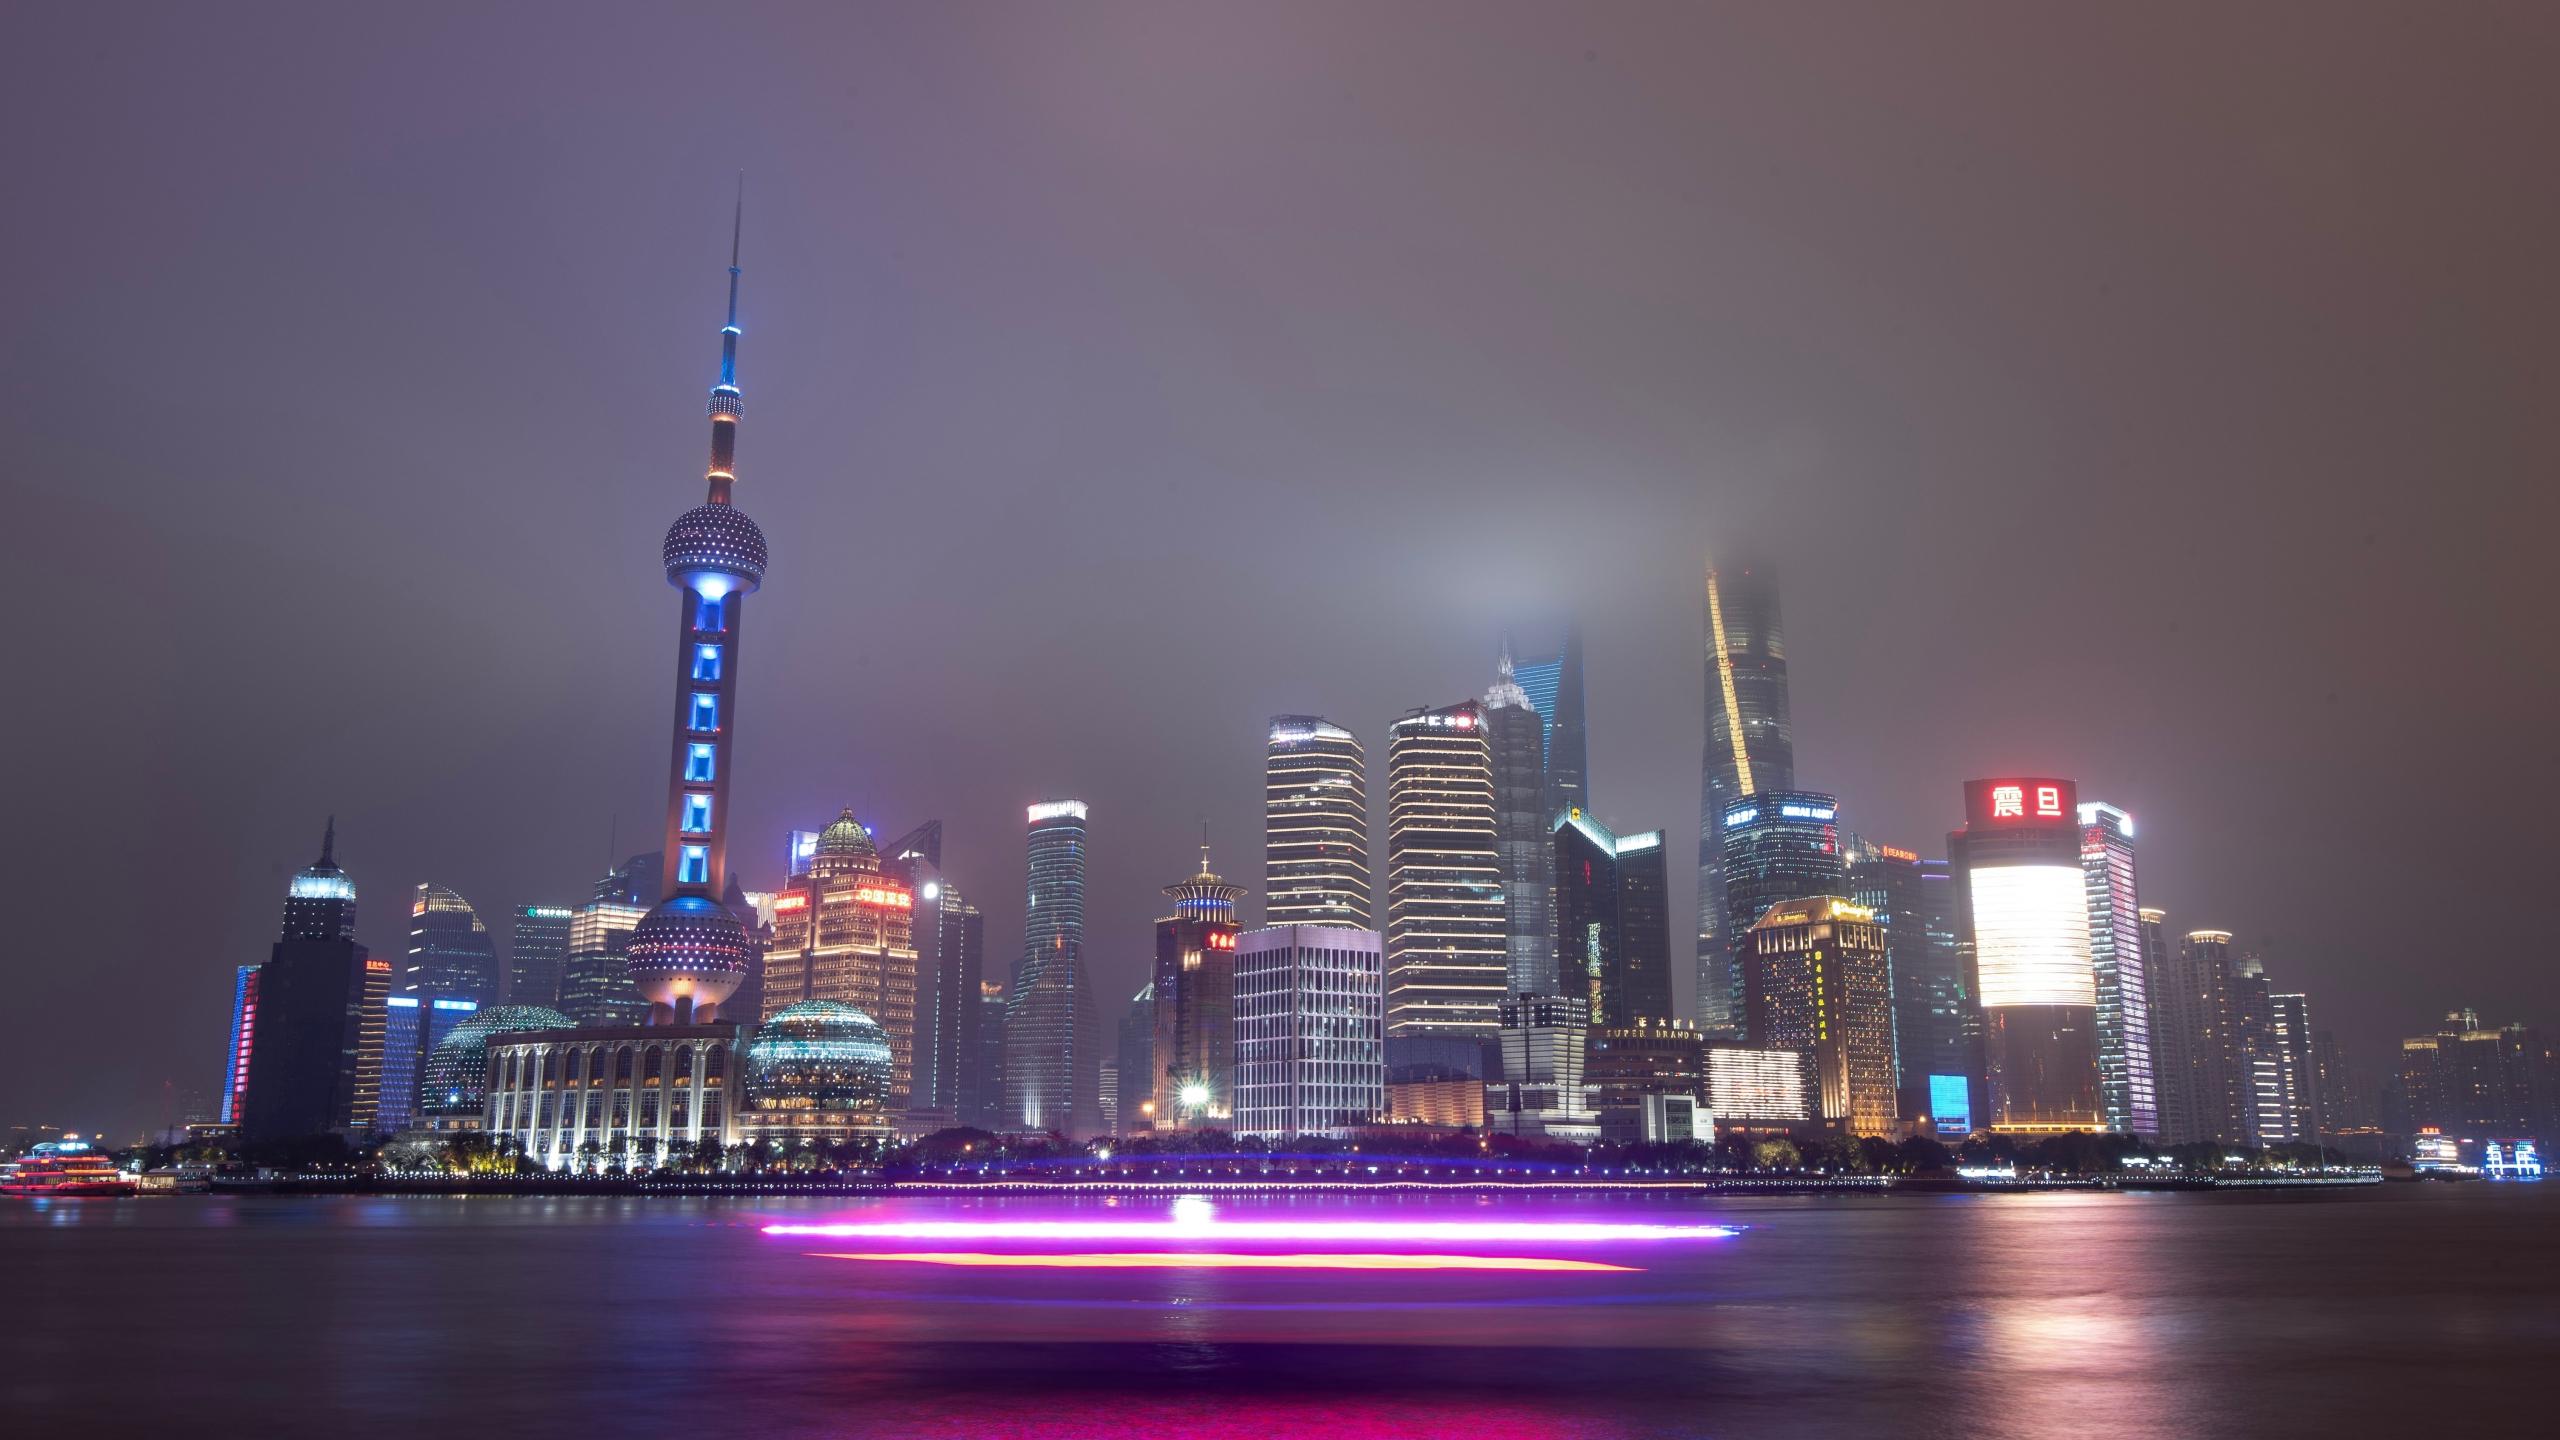 Download 2560x1440 Wallpaper Urban City Shanghai Night Cityscape Dual Wide Widescreen 16 9 Widescreen 2560x1440 Hd Image Background 19739